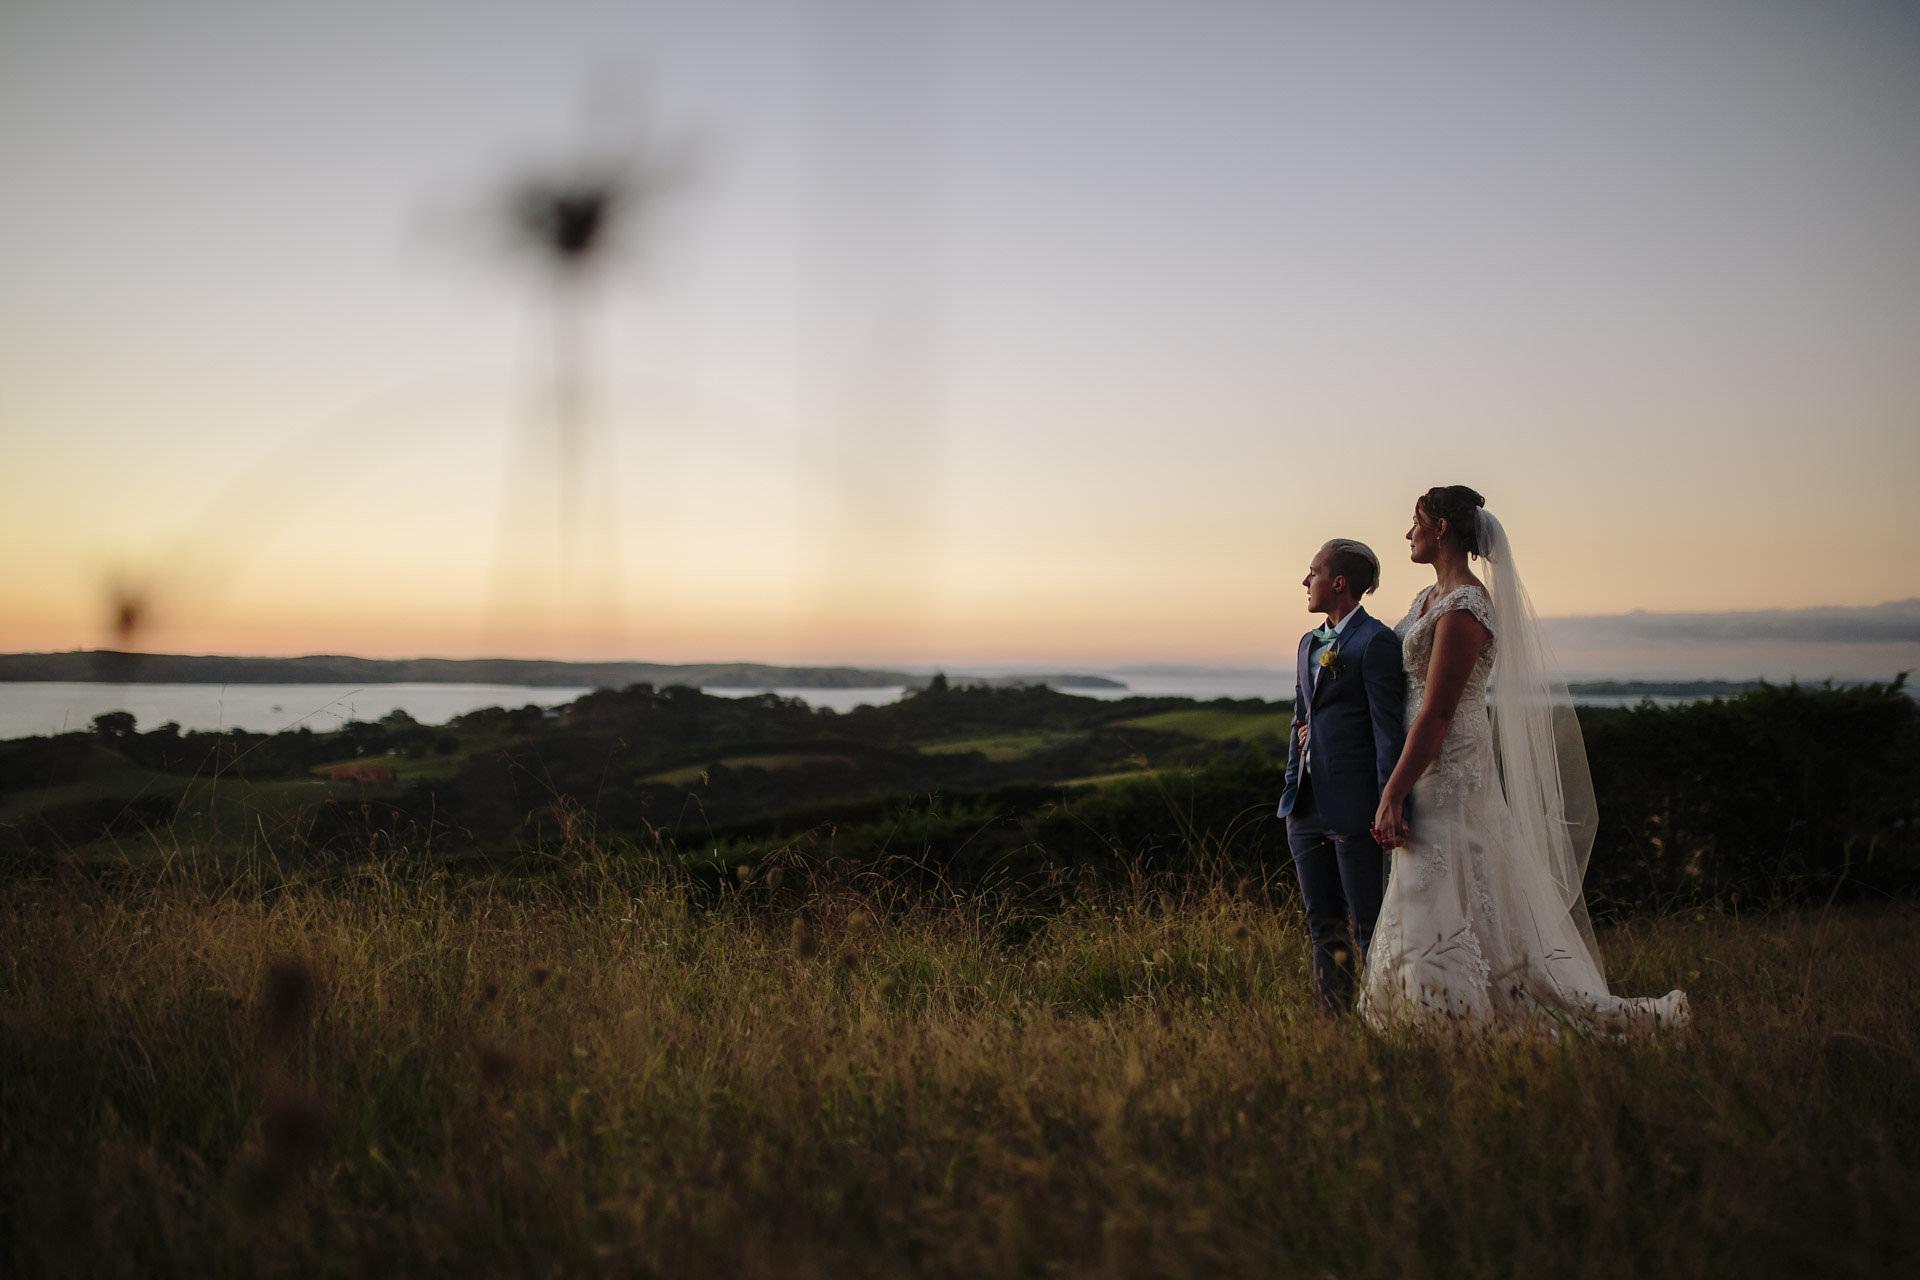 TOP_8941-Amanda-Tash-The-official-photographers-wedding